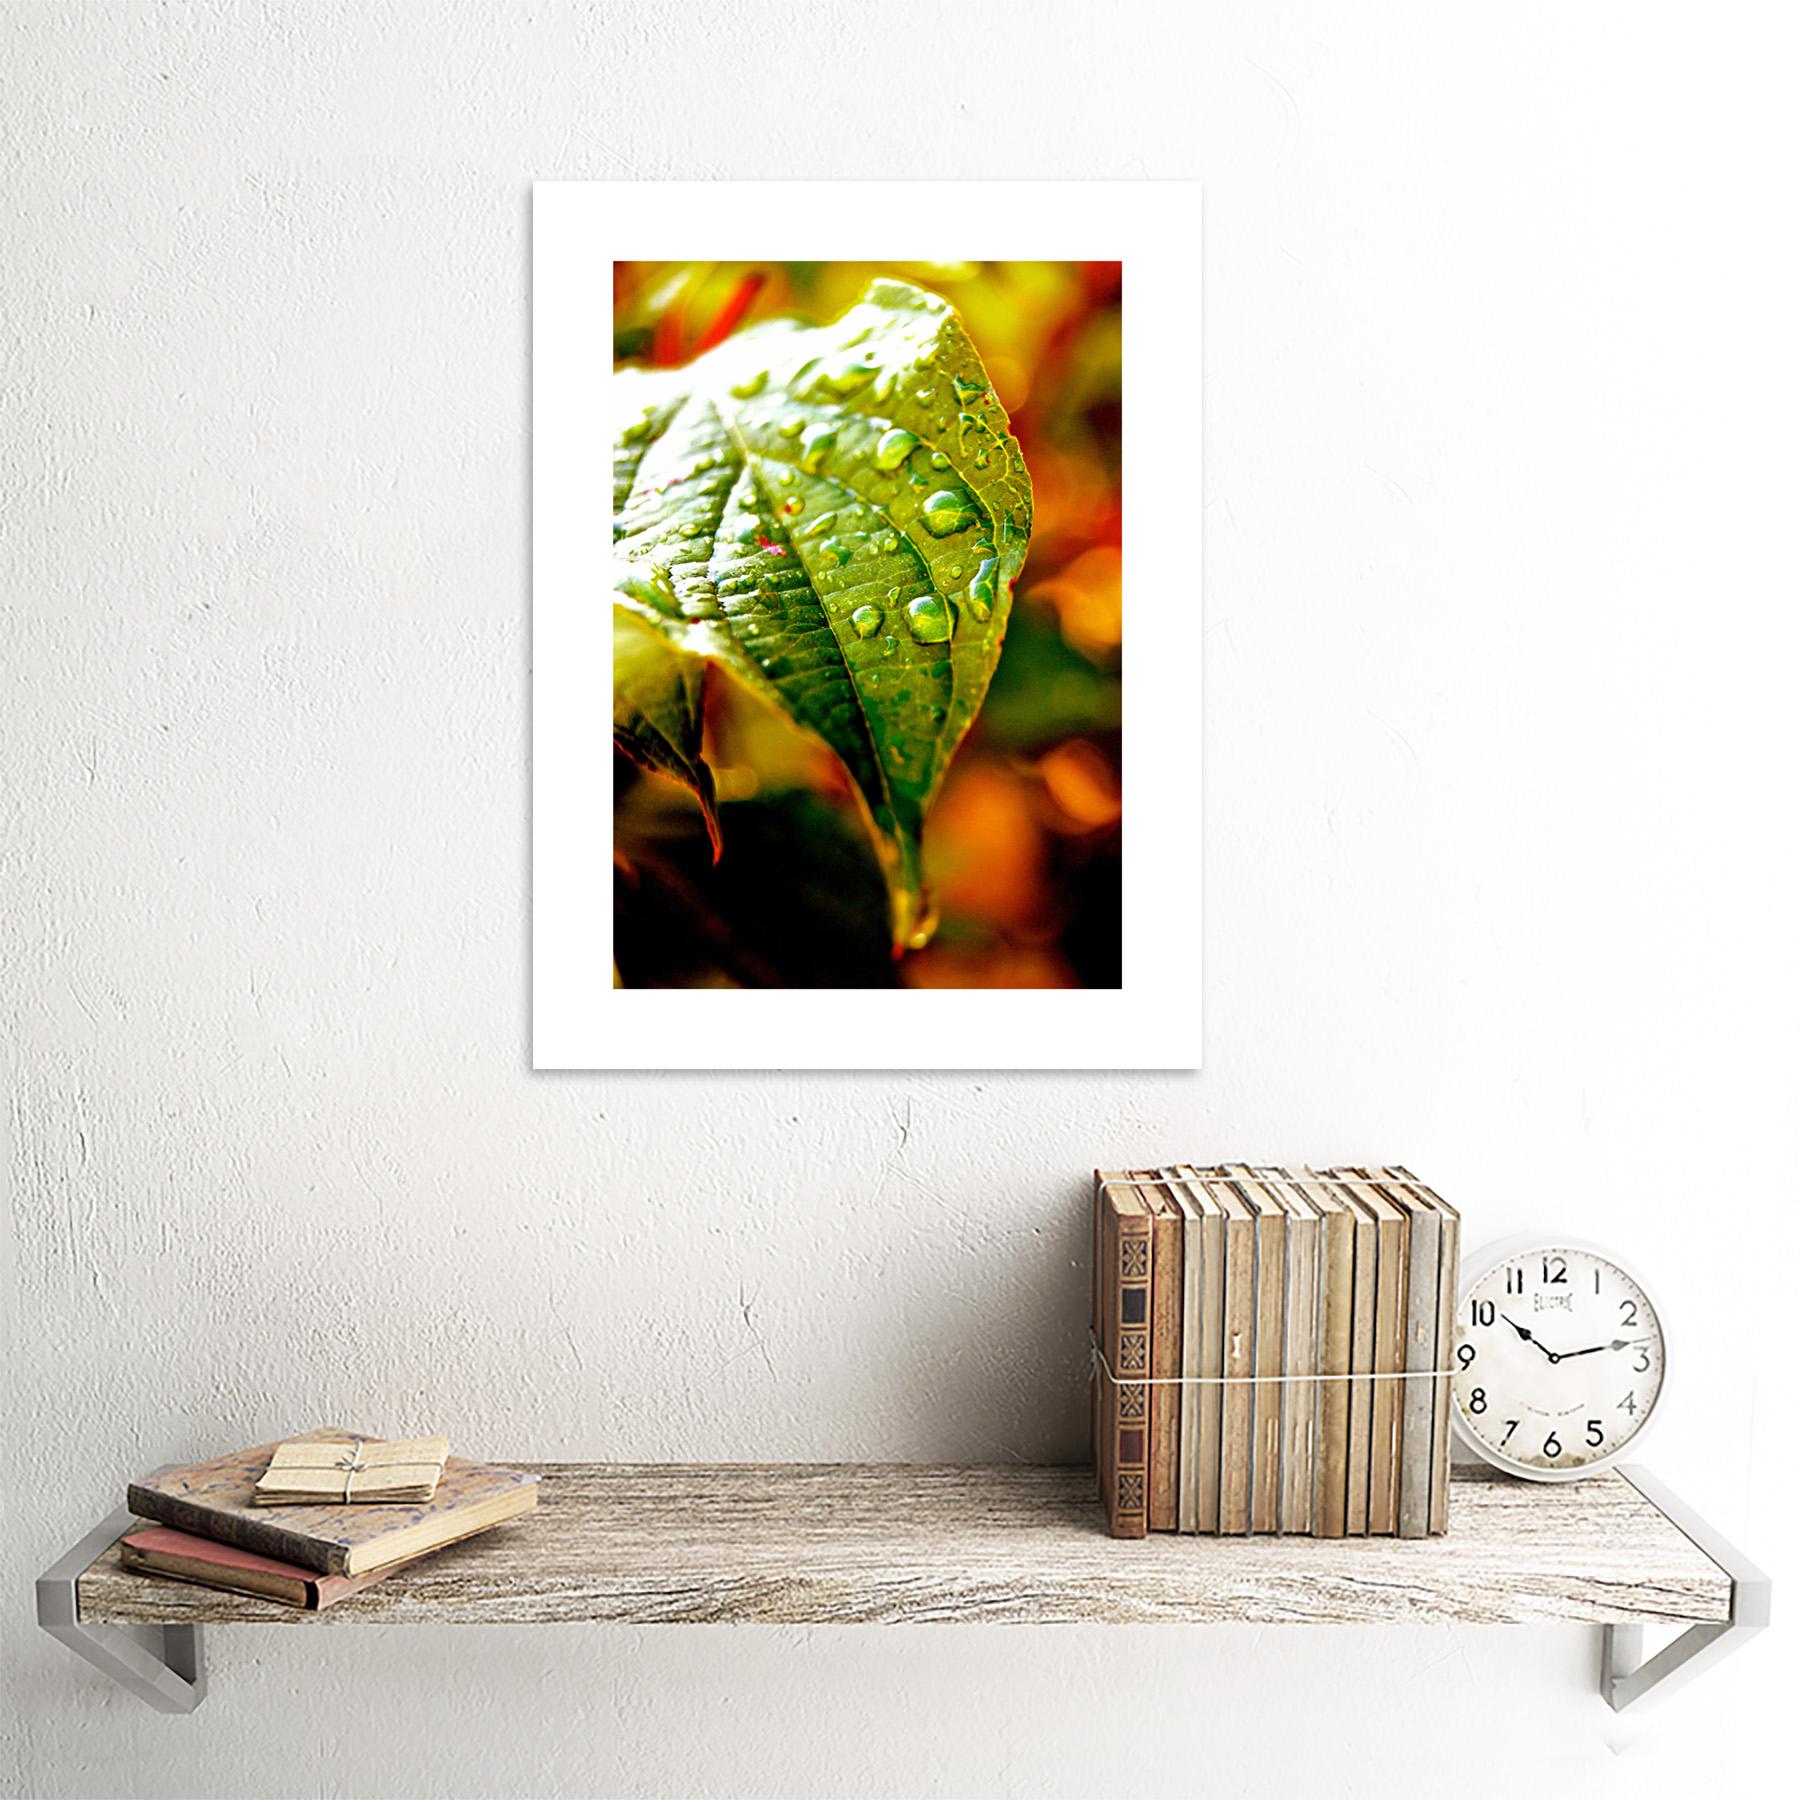 Photo-Leaf-Water-Drop-Green-Nature-Framed-Print-12x16-Inch miniatuur 18